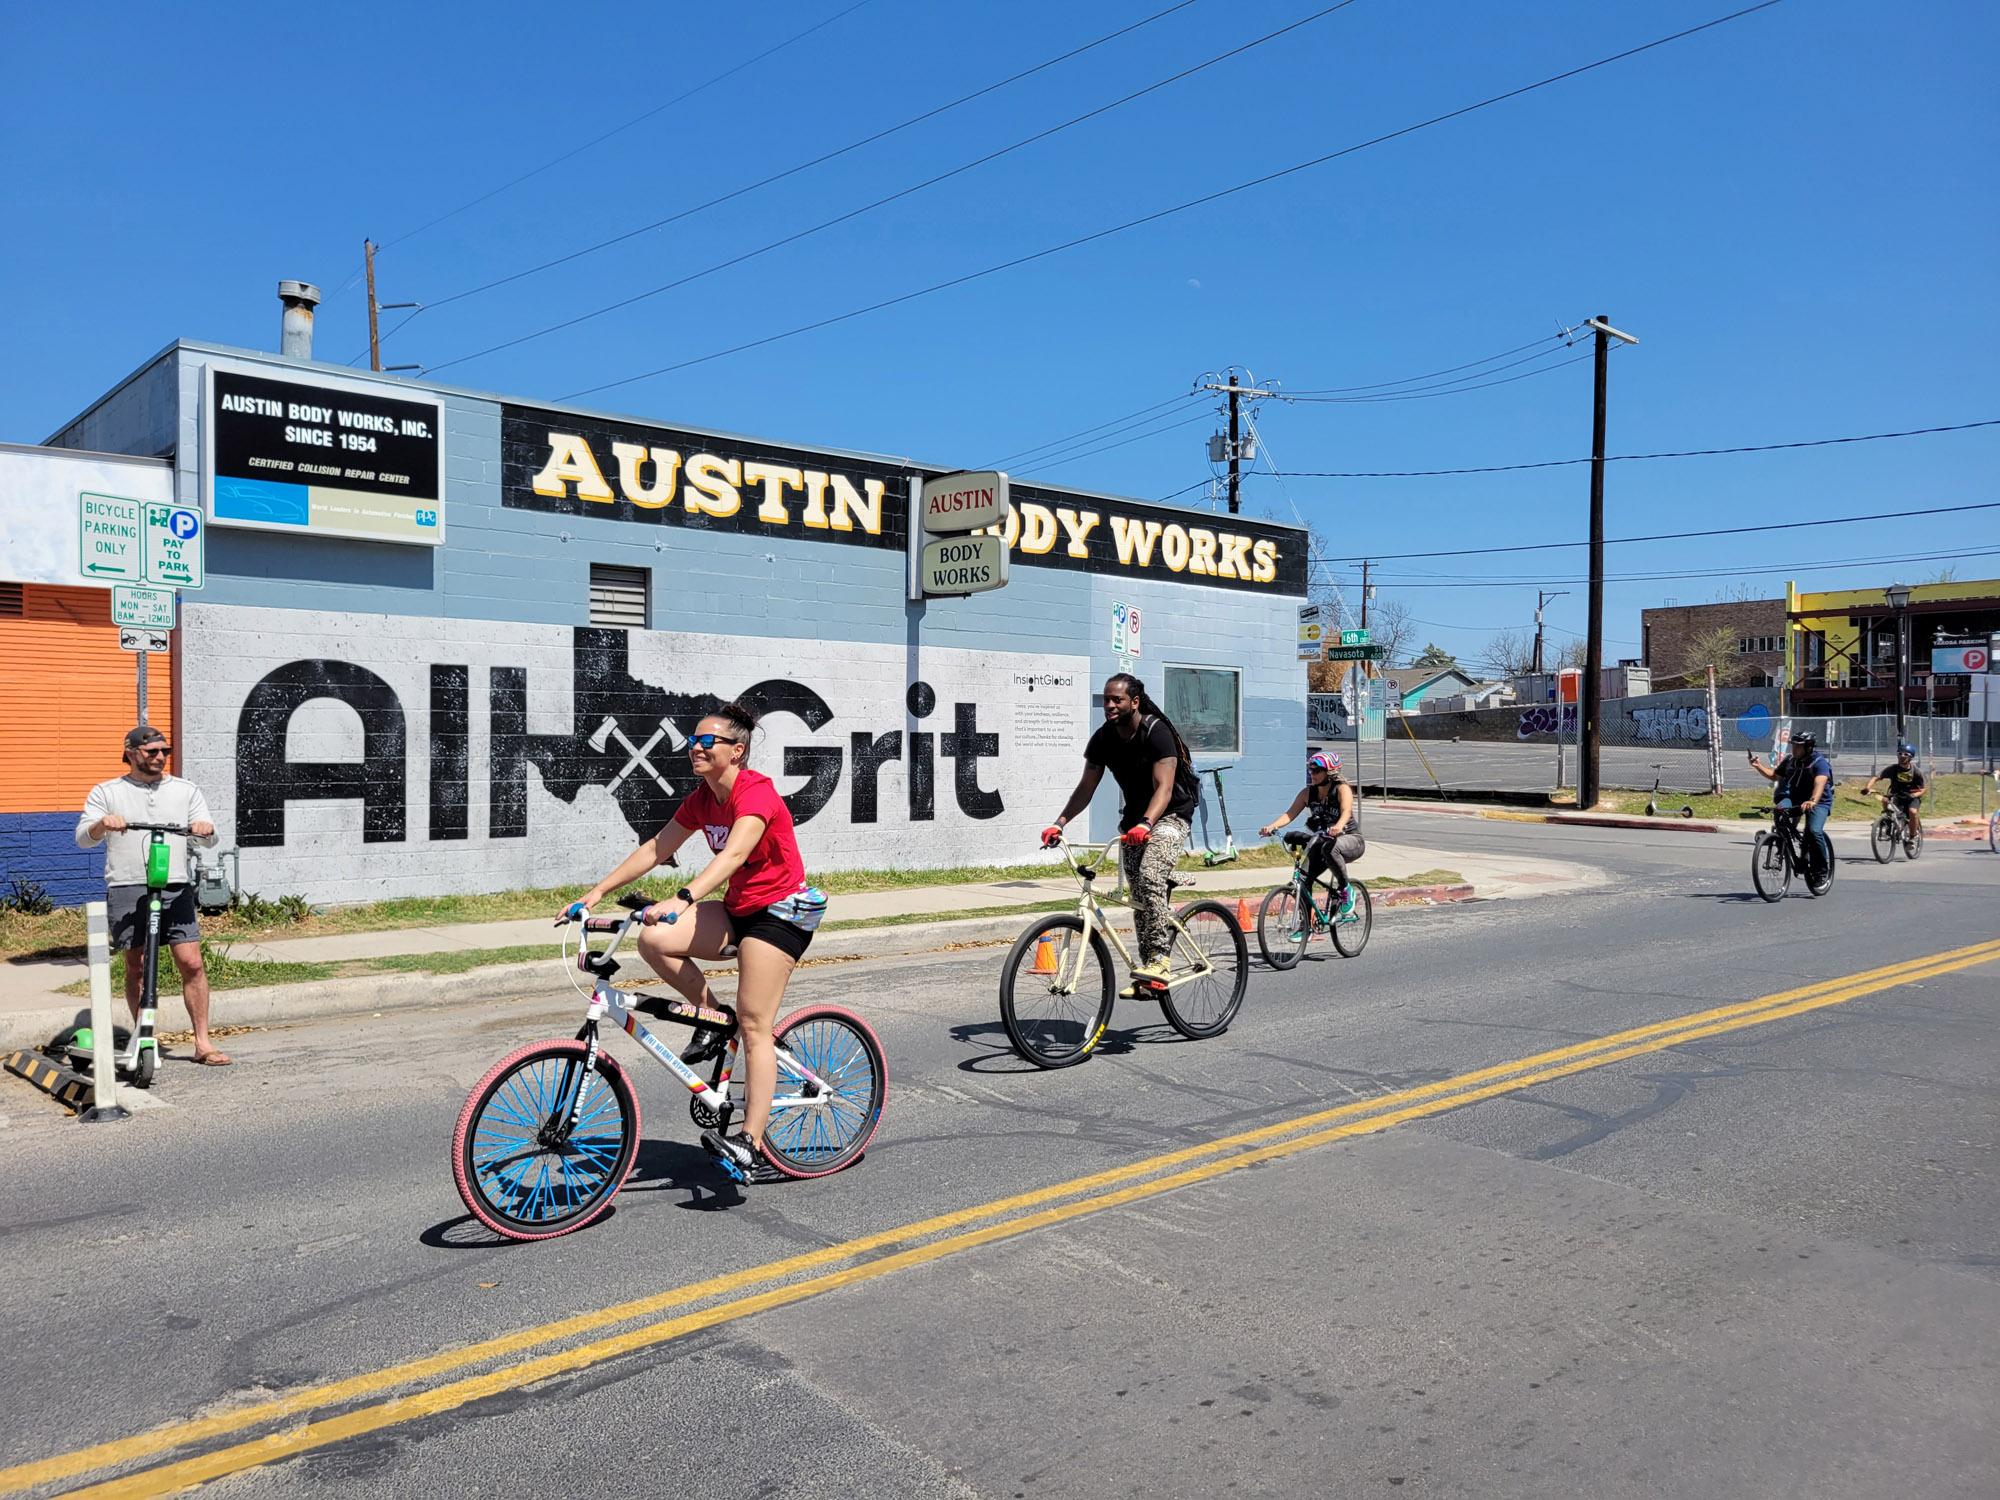 All Grit Austin - Street Art